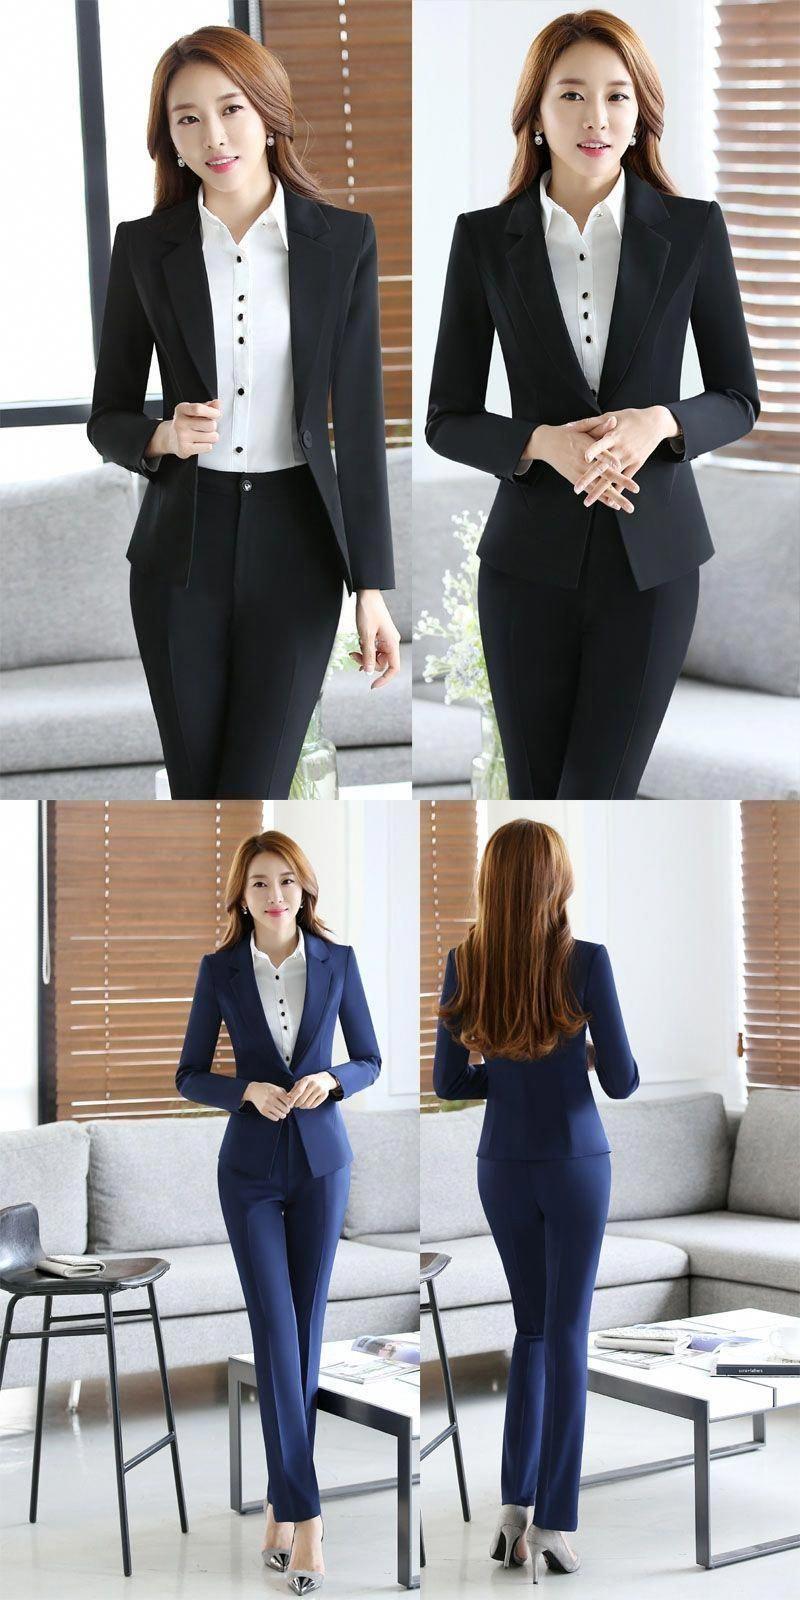 a65382fb01b New Arrival Slim Fashion 2016 Professionan Formal Female Pantsuits With  Blazer + Pants Ladies Trousers Sets Women Pants Suits  #womensfashionprofessional # ...